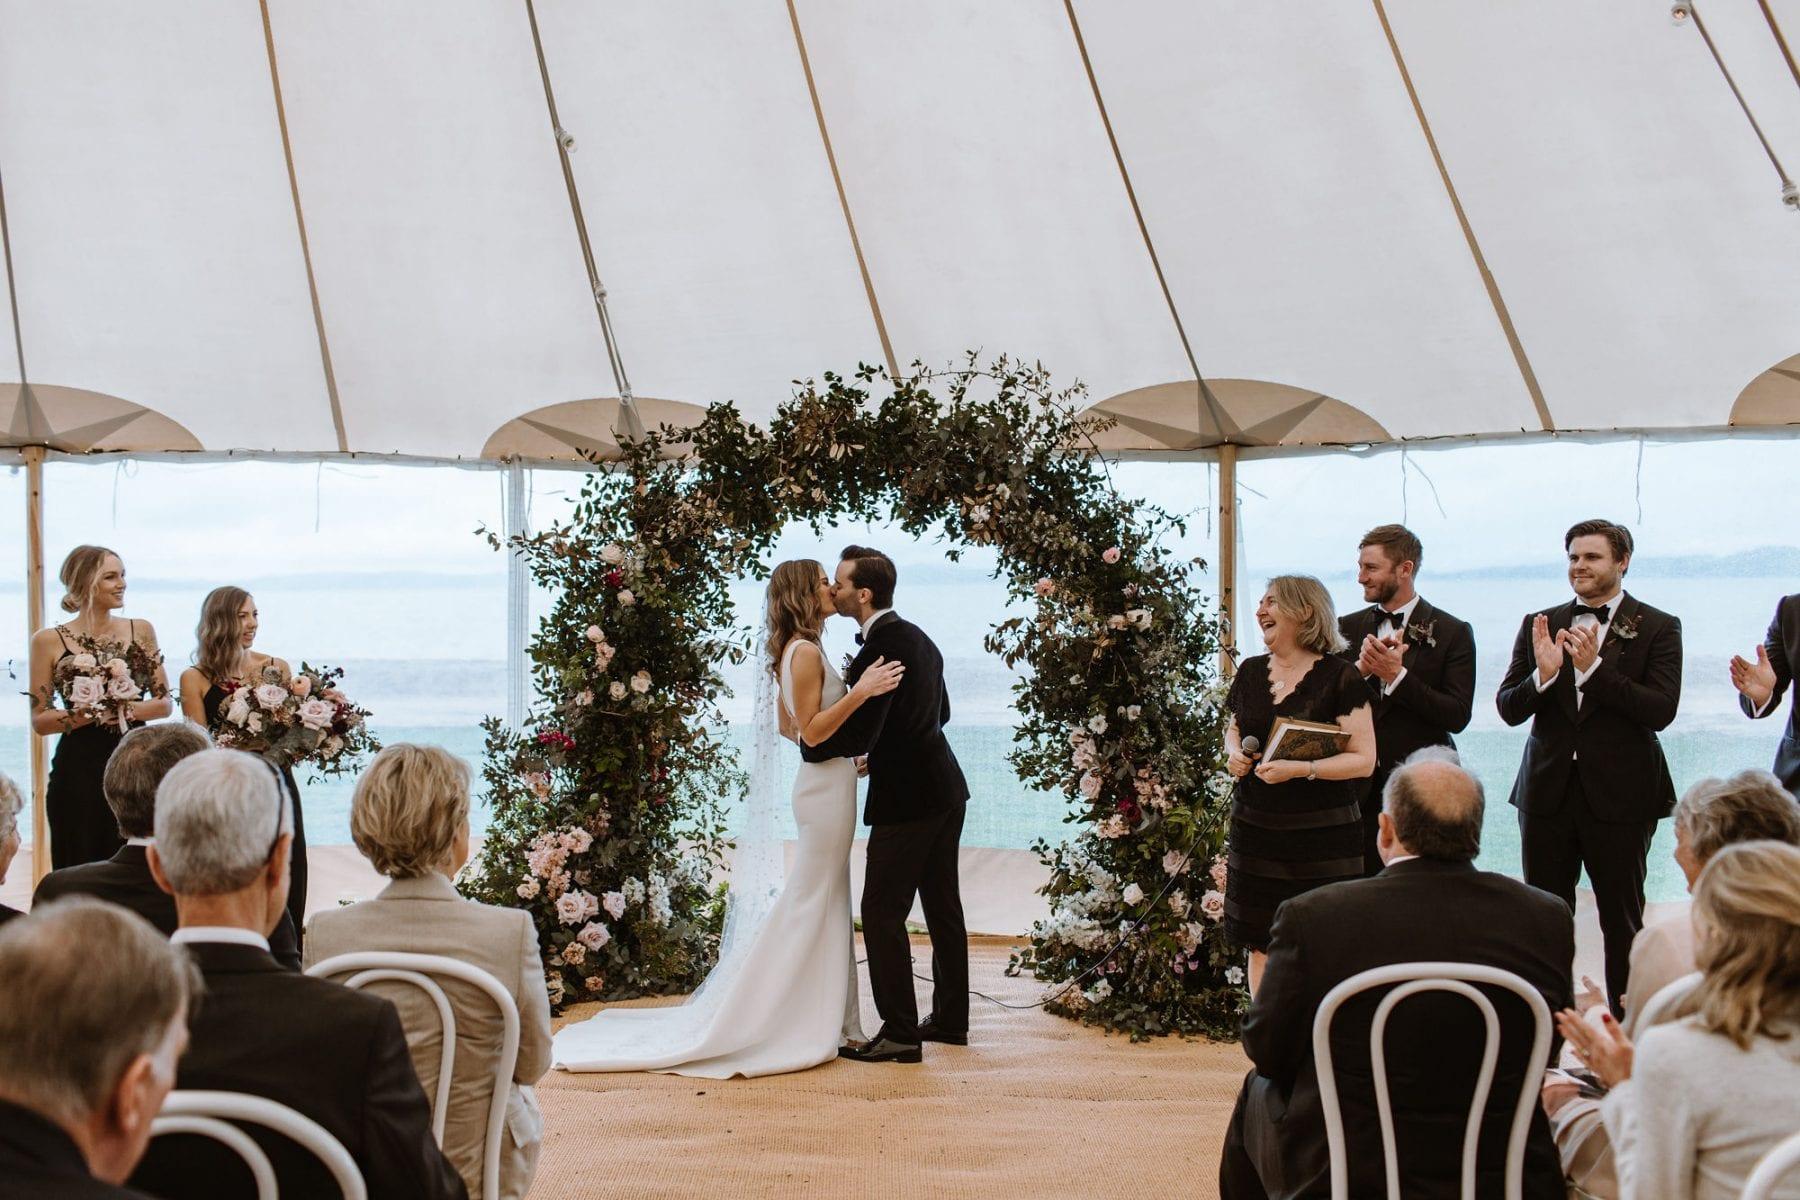 On My Hand Florist - real wedding portfolio - Rachel and Jonny wedding - flower archway